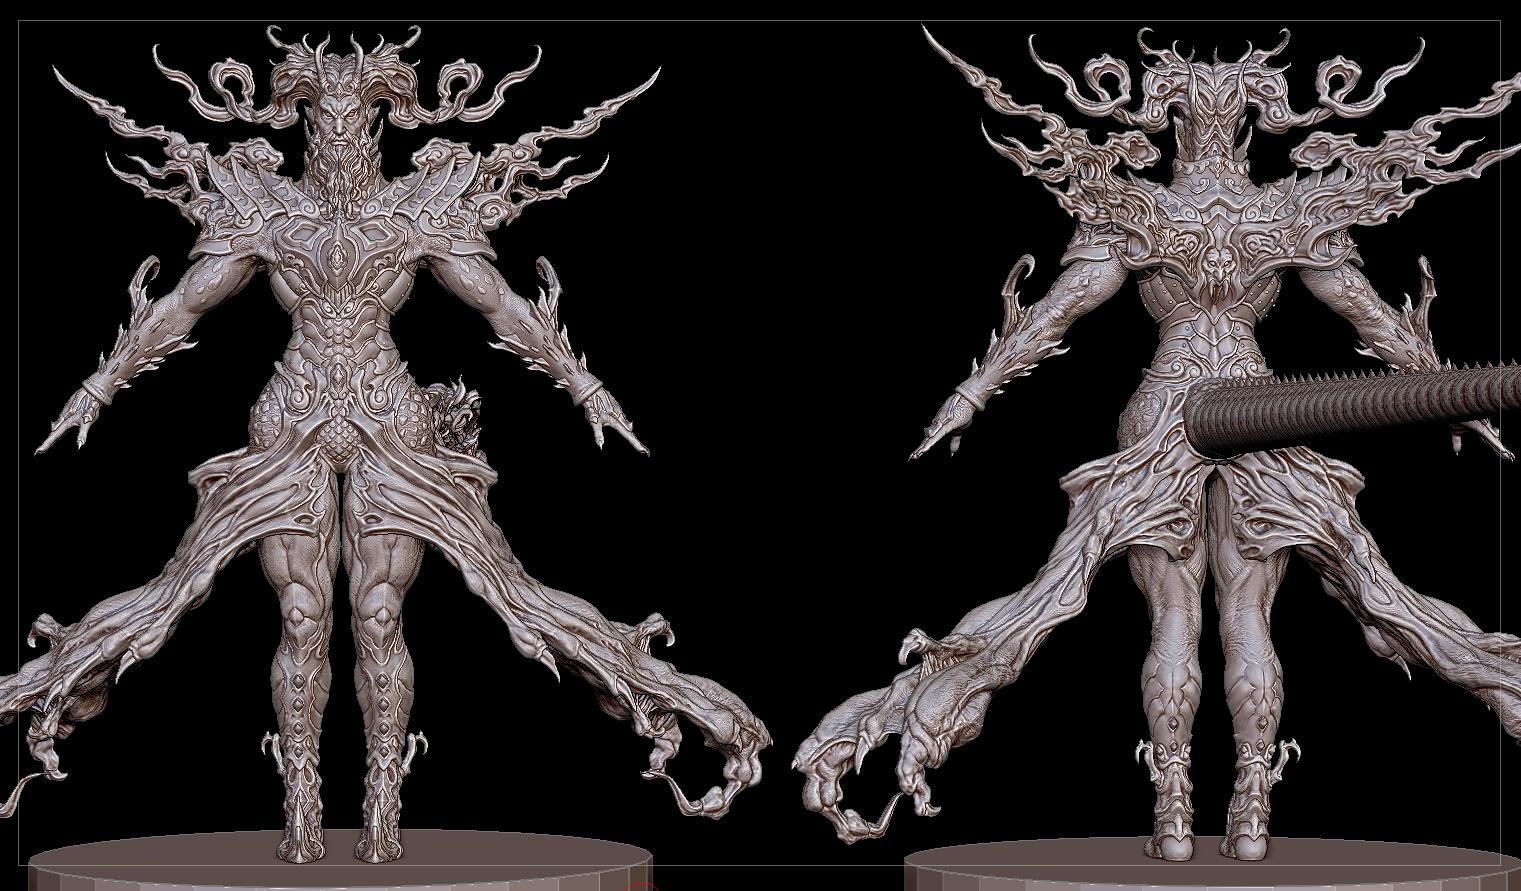 20190429_yn_09_Cid_sculpt.jpg